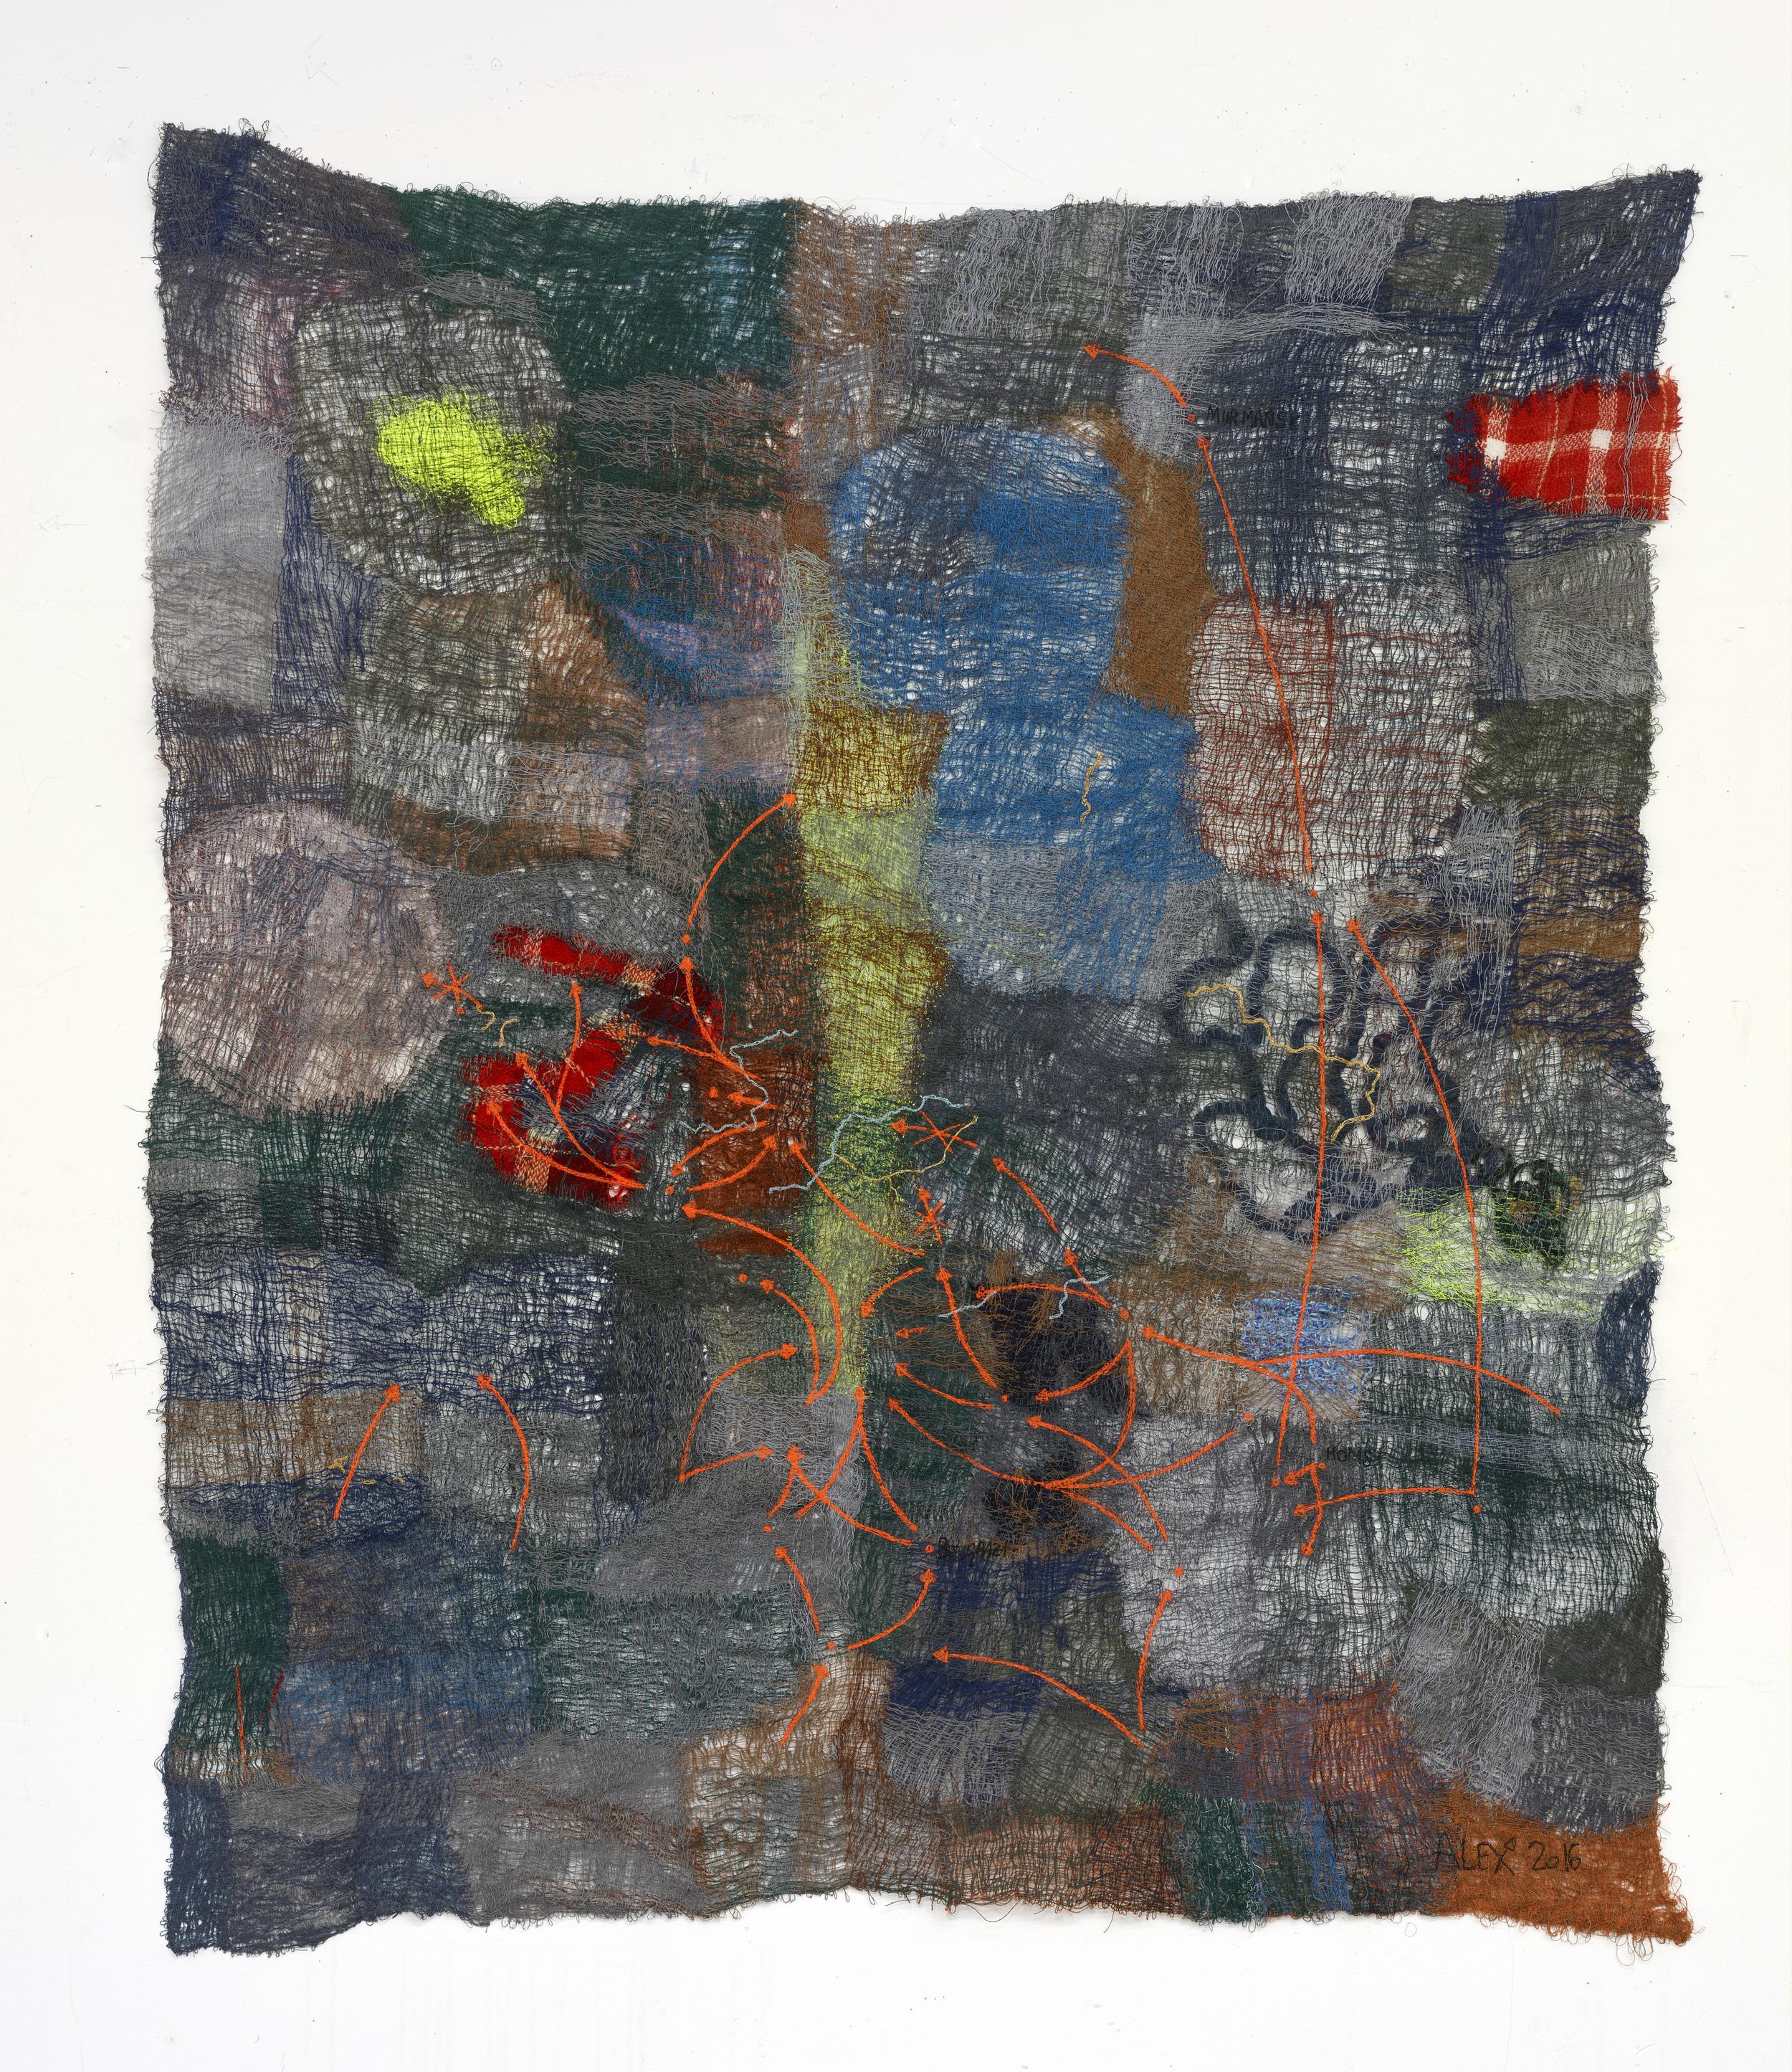 Traffic 2016 Polyester, wool, viscose 146 x 123 cm / 57.4 x 48.4 in